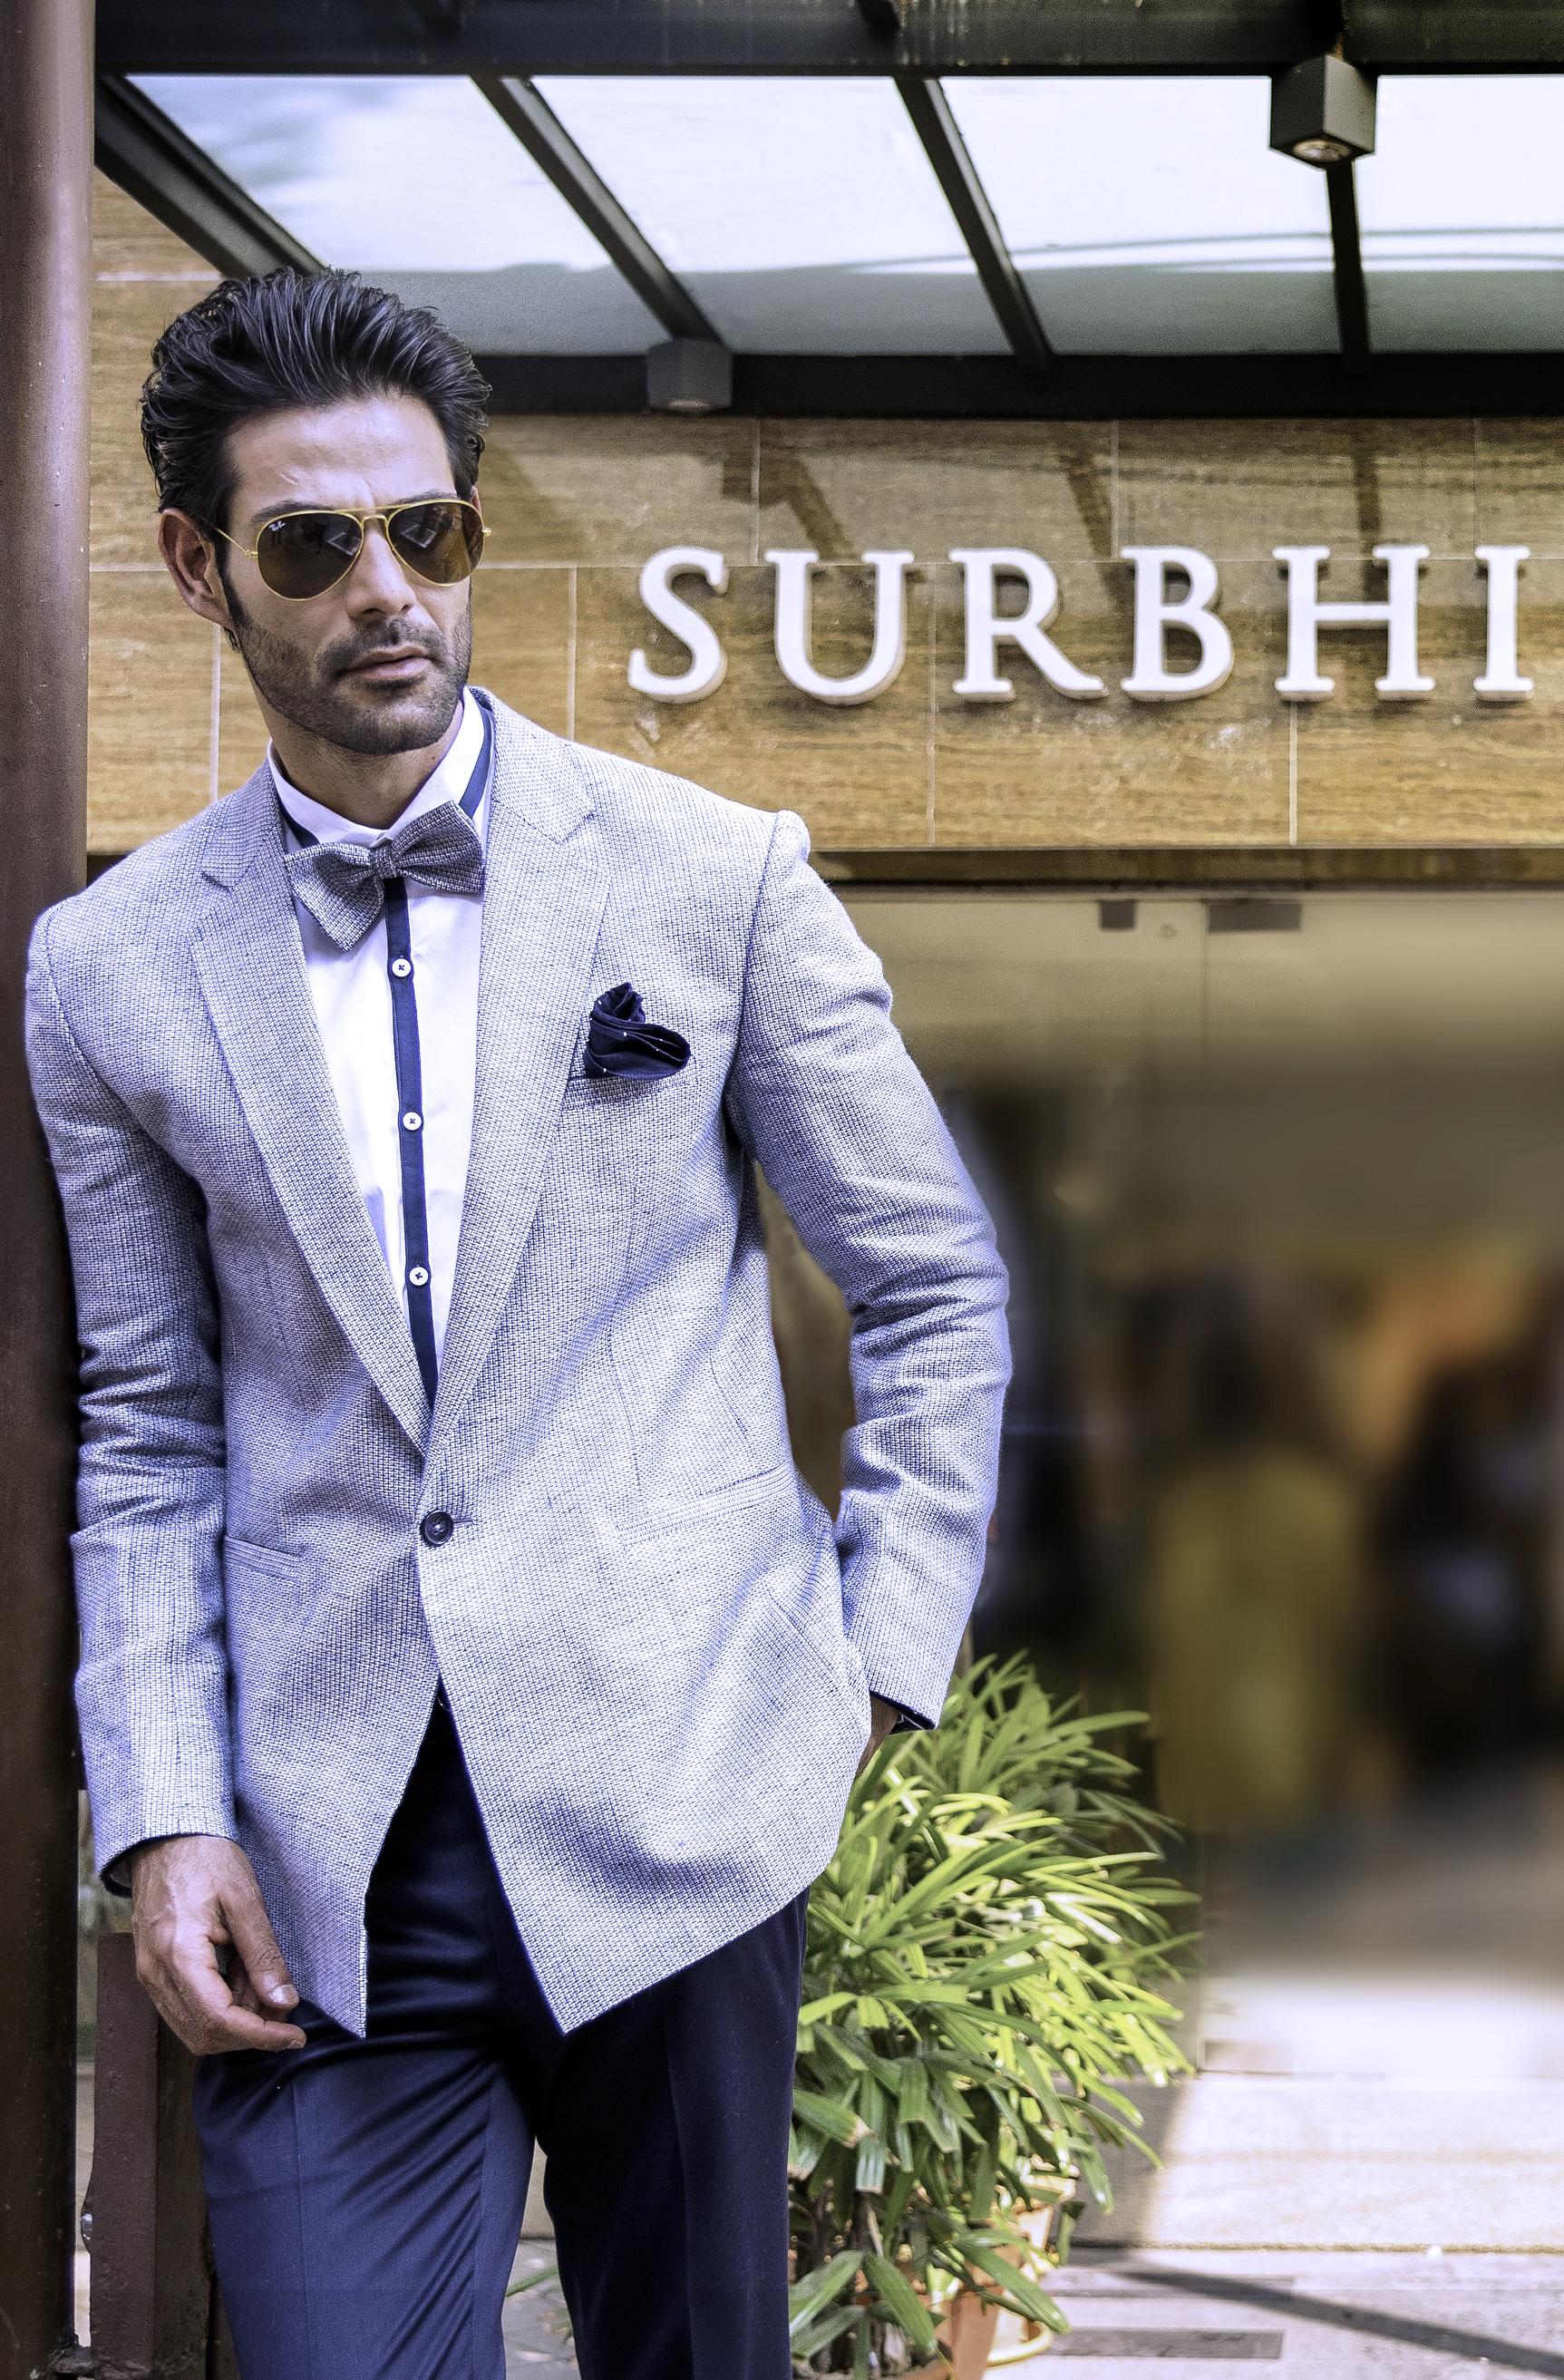 Designer Surbhi Pansari launches Spring Summer Collection, 2016- https://cherryontopblog.com/2016/04/surbhi-pansari-spring-summer-2016.html